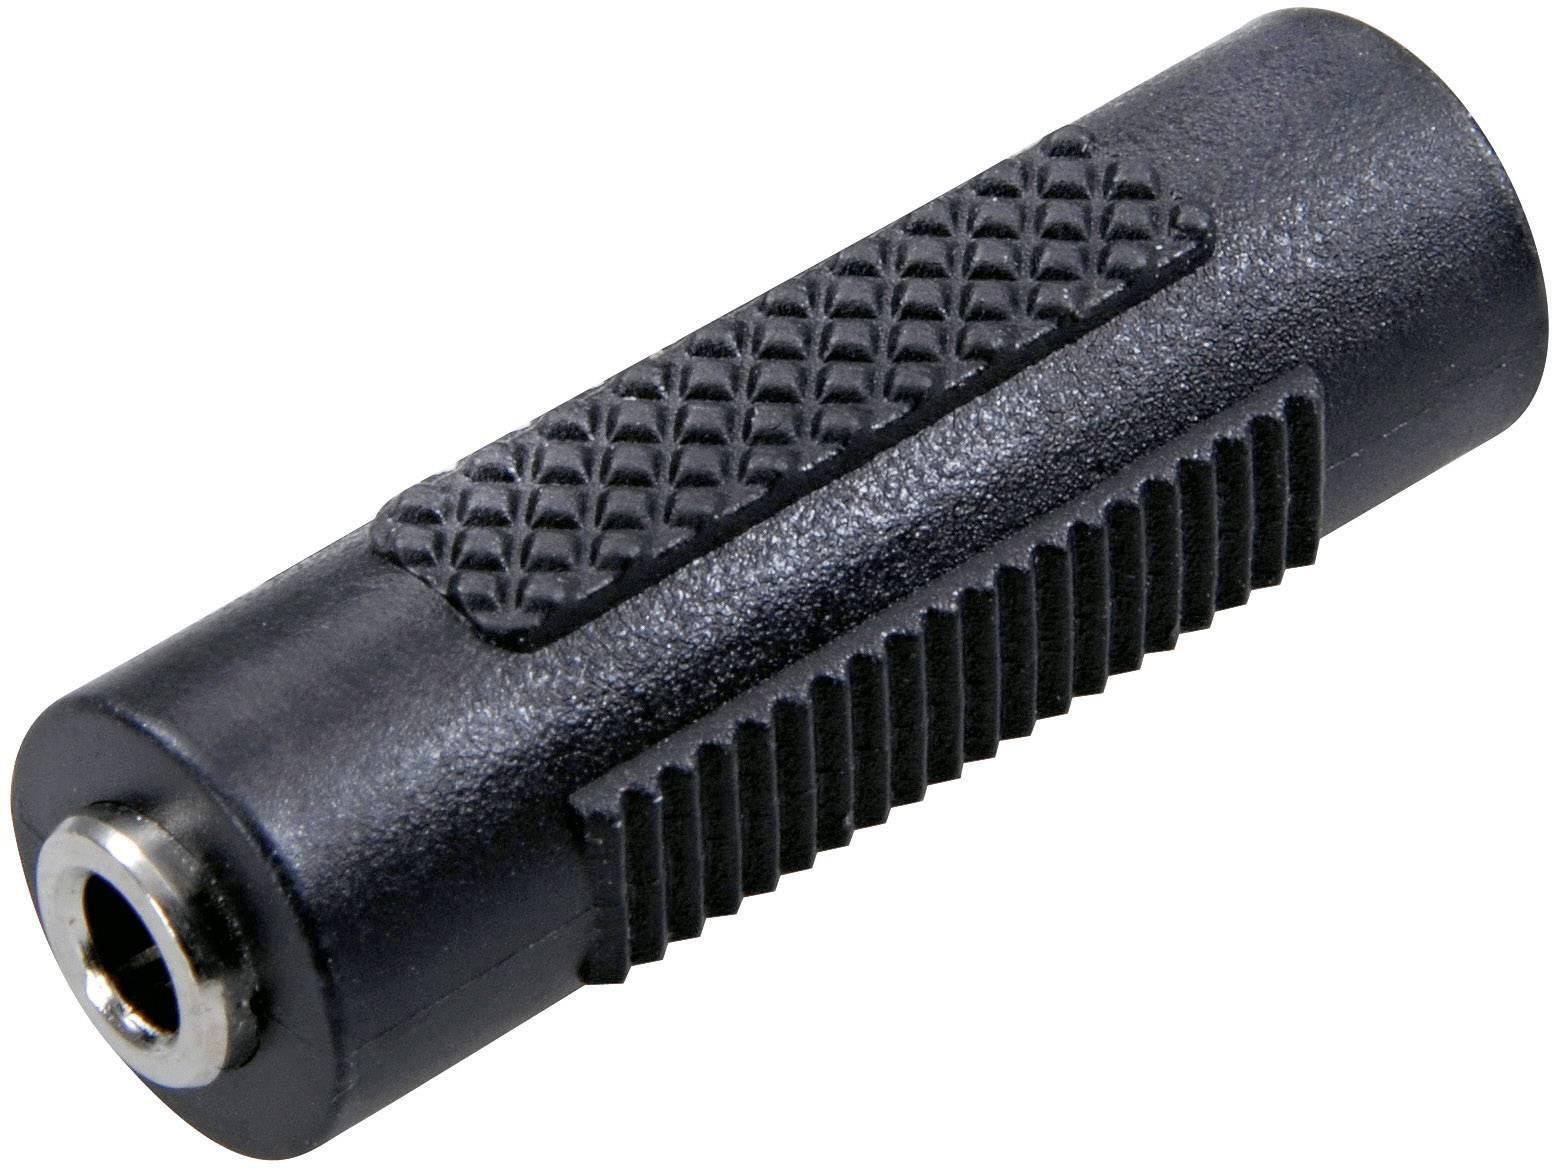 Jack audio adaptér SpeaKa, jack zásuvka 3,5 mm/jack zásuvka 3,5 mm